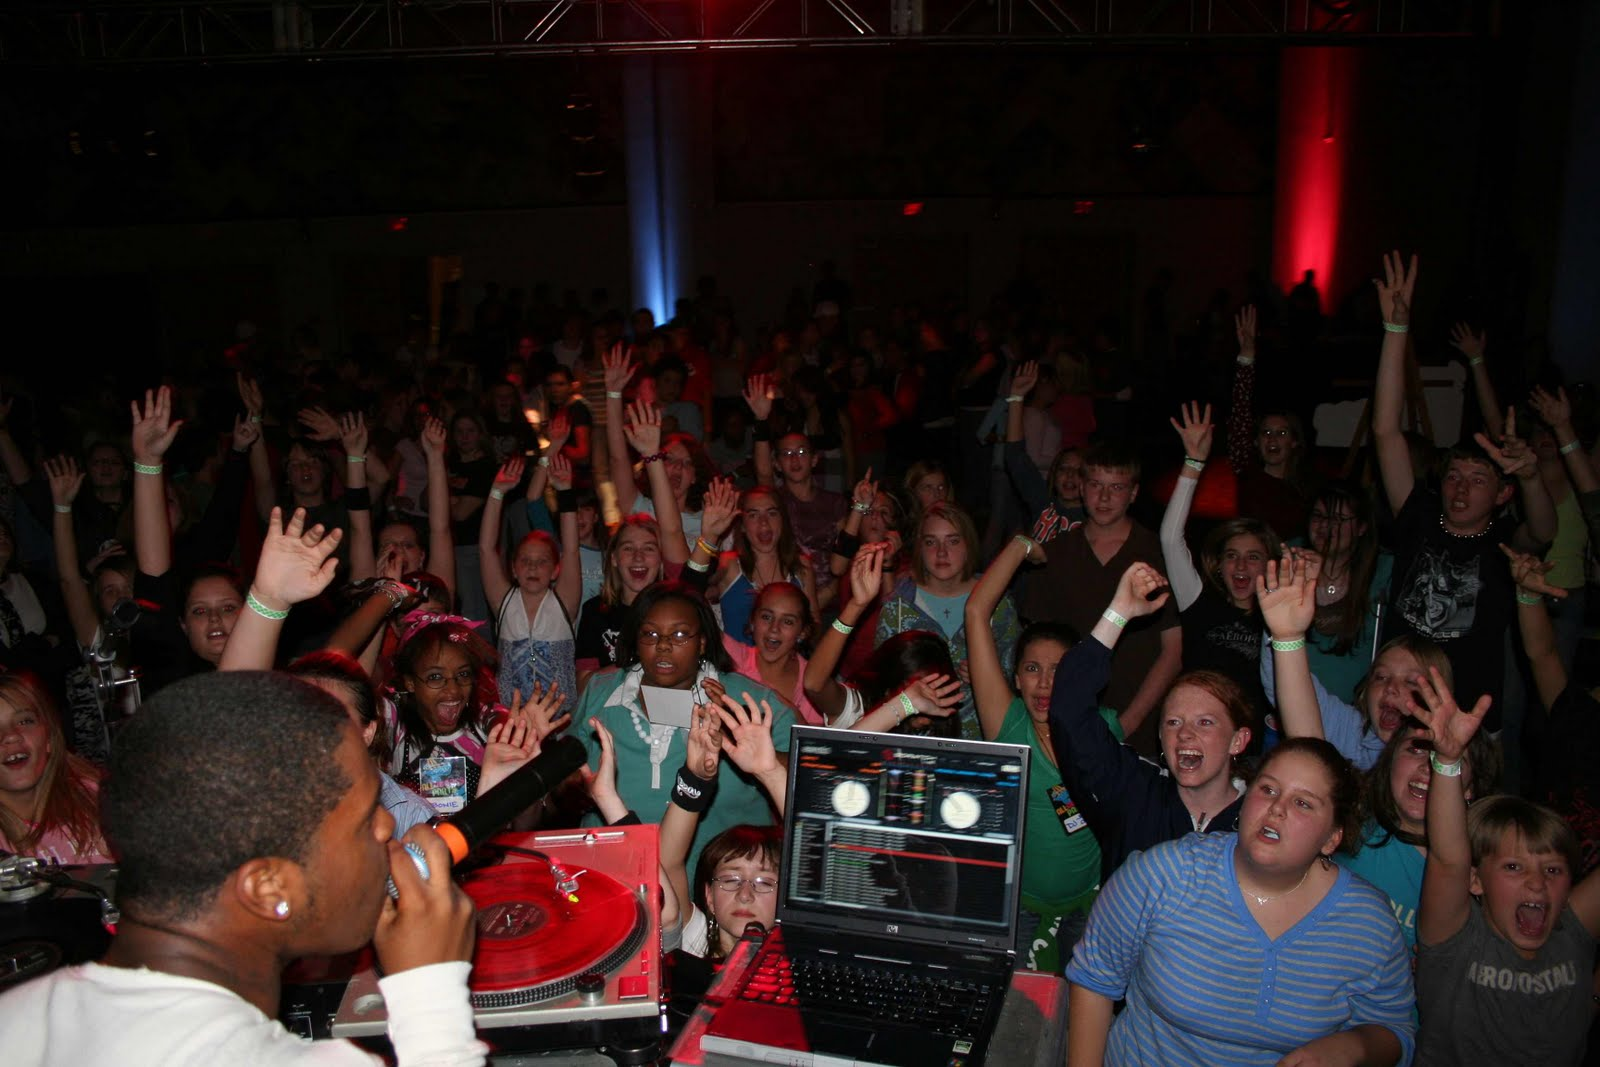 http://2.bp.blogspot.com/_pkwOny5Y9pY/TKgaTo5dGFI/AAAAAAAAAMo/7LZkqj8RnYE/s1600/party.jpeg